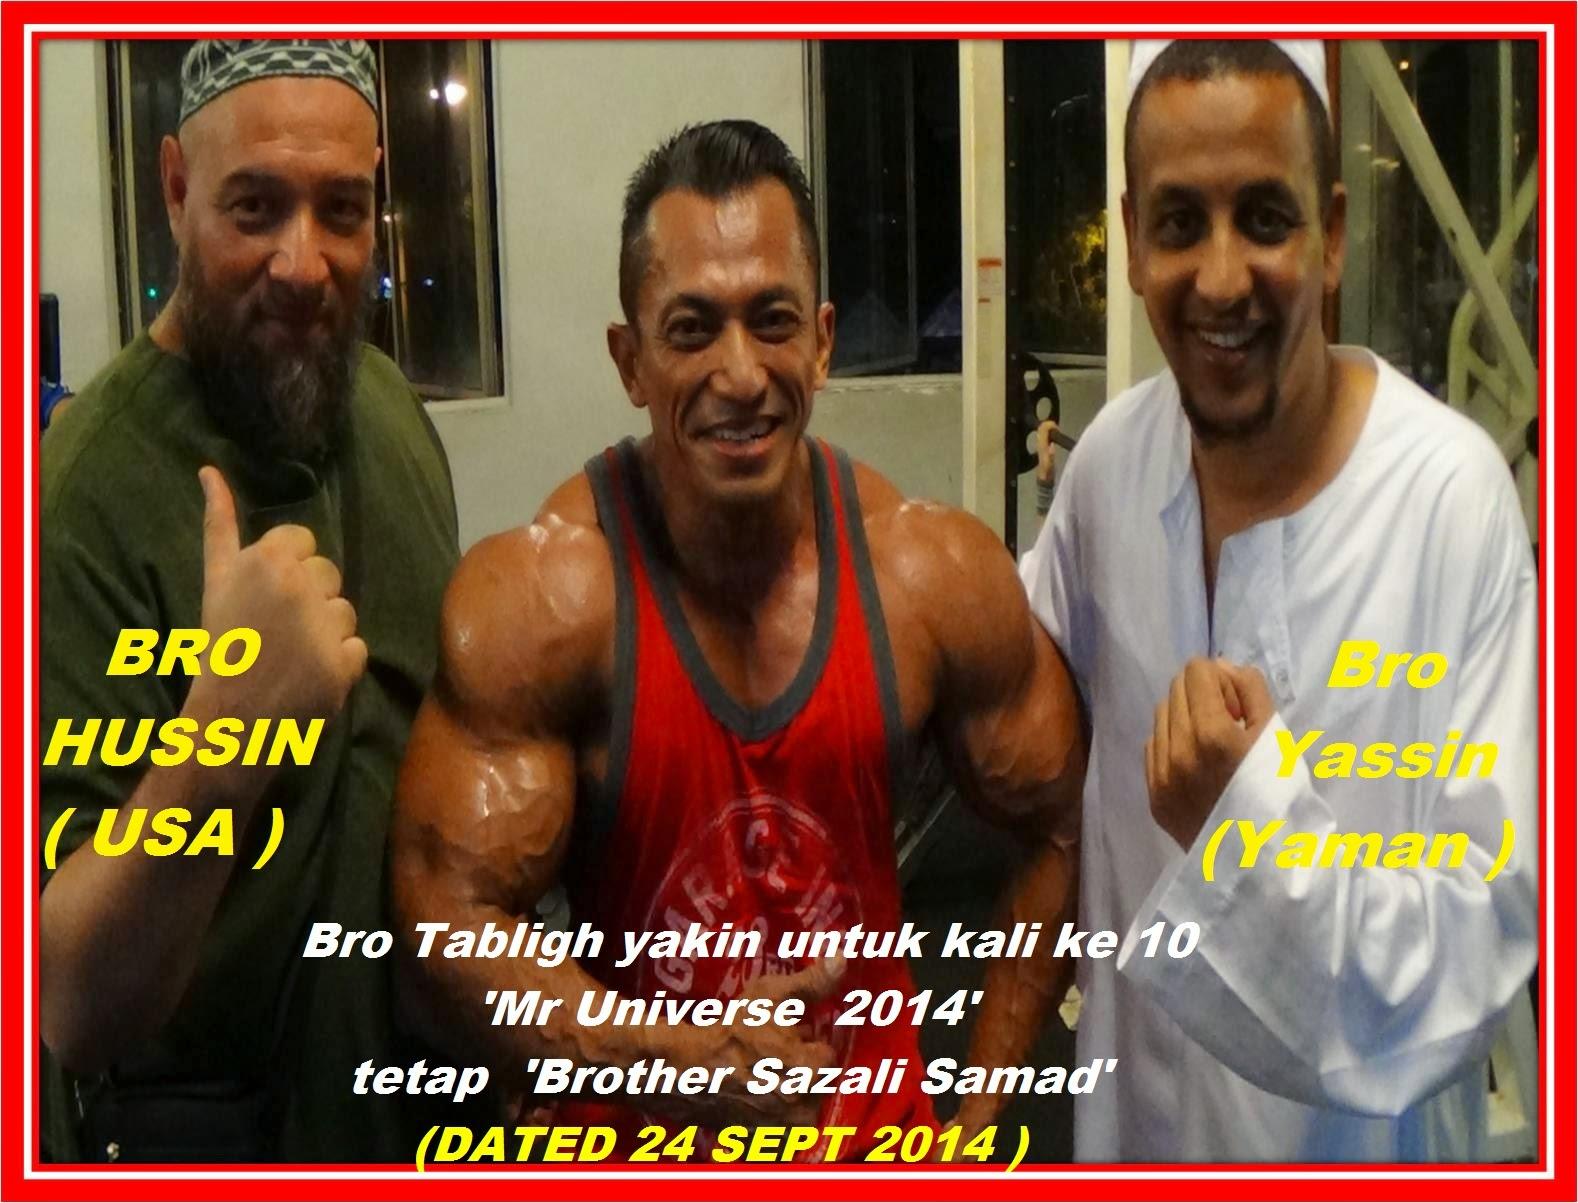 Tabligh tahu Kejayaan Bro Sazali Samad